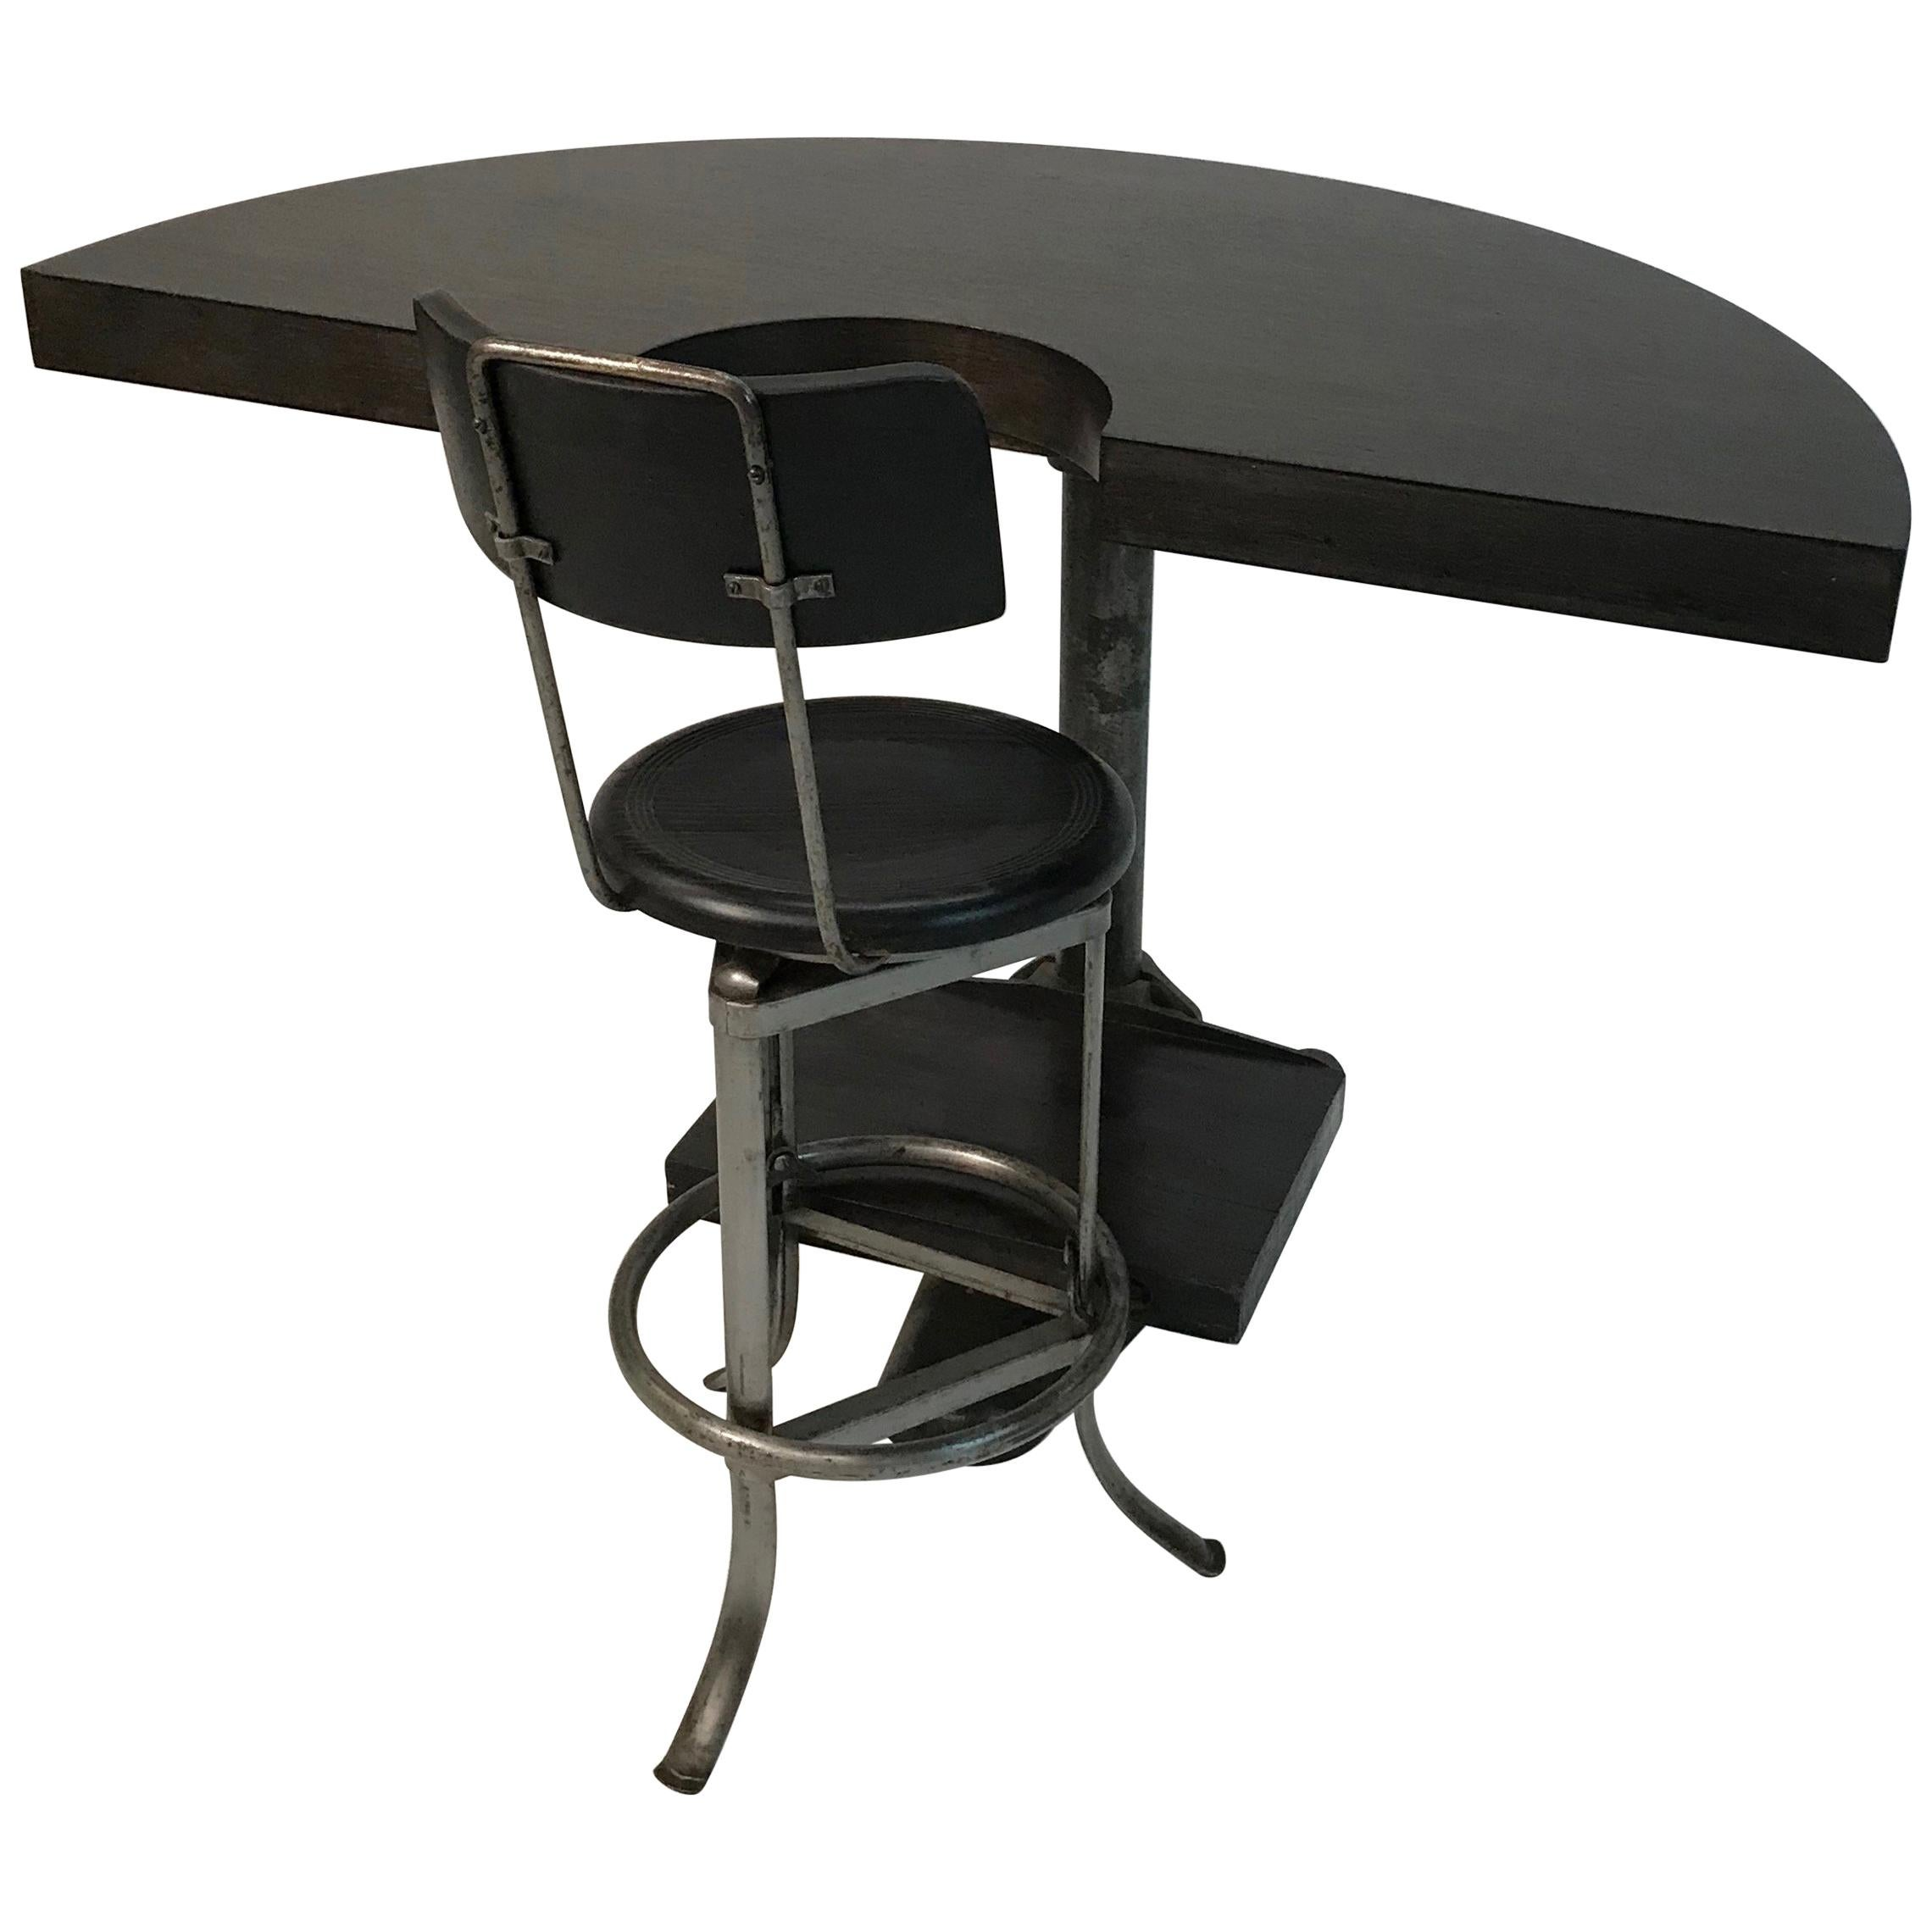 Custom Industrial Demilune Counter Desk